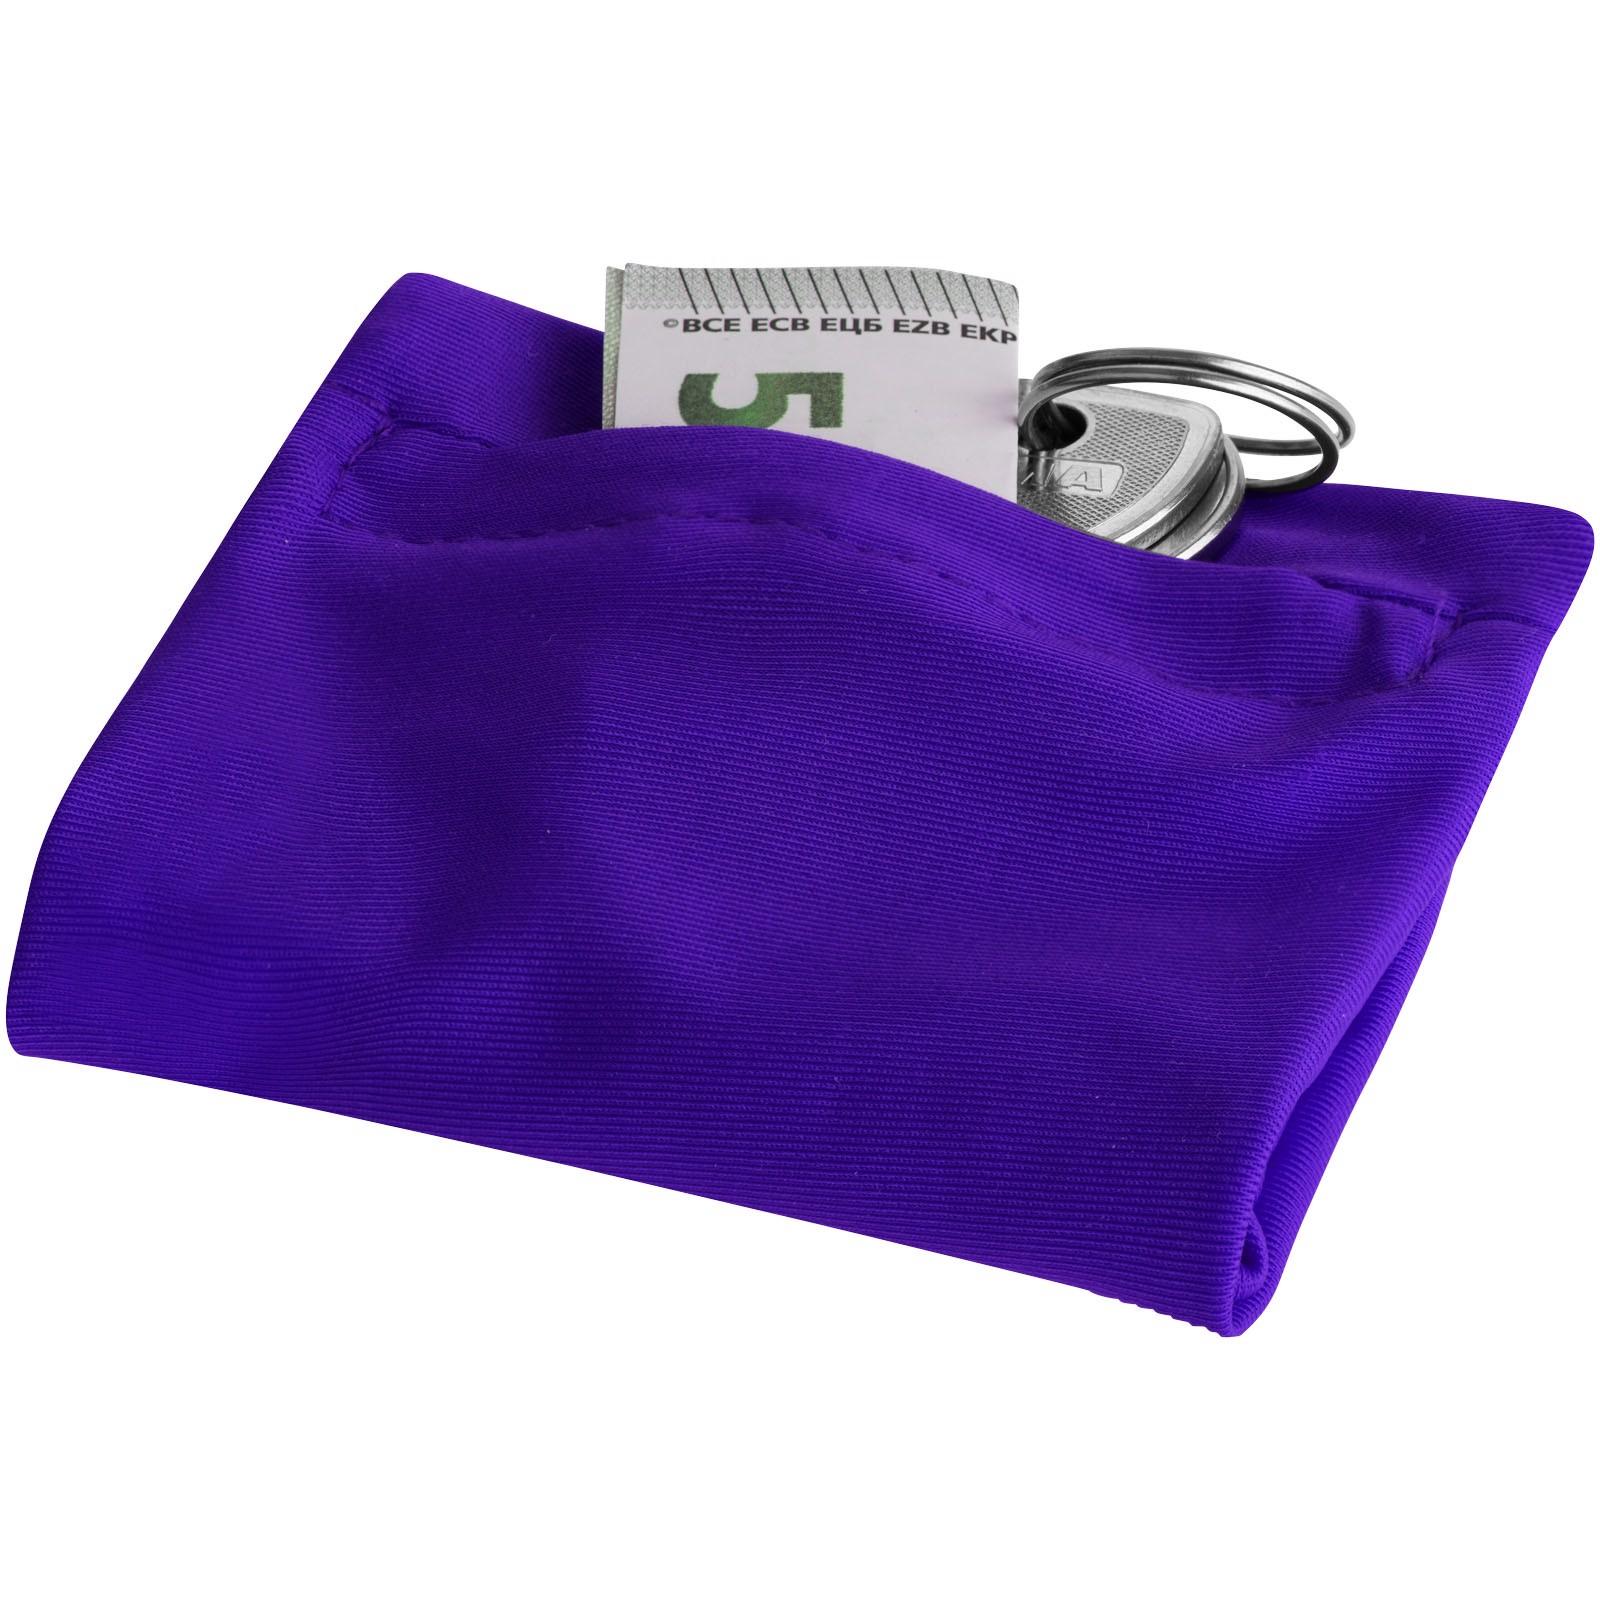 Squat Armband mit Reißverschlusstasche - Lila